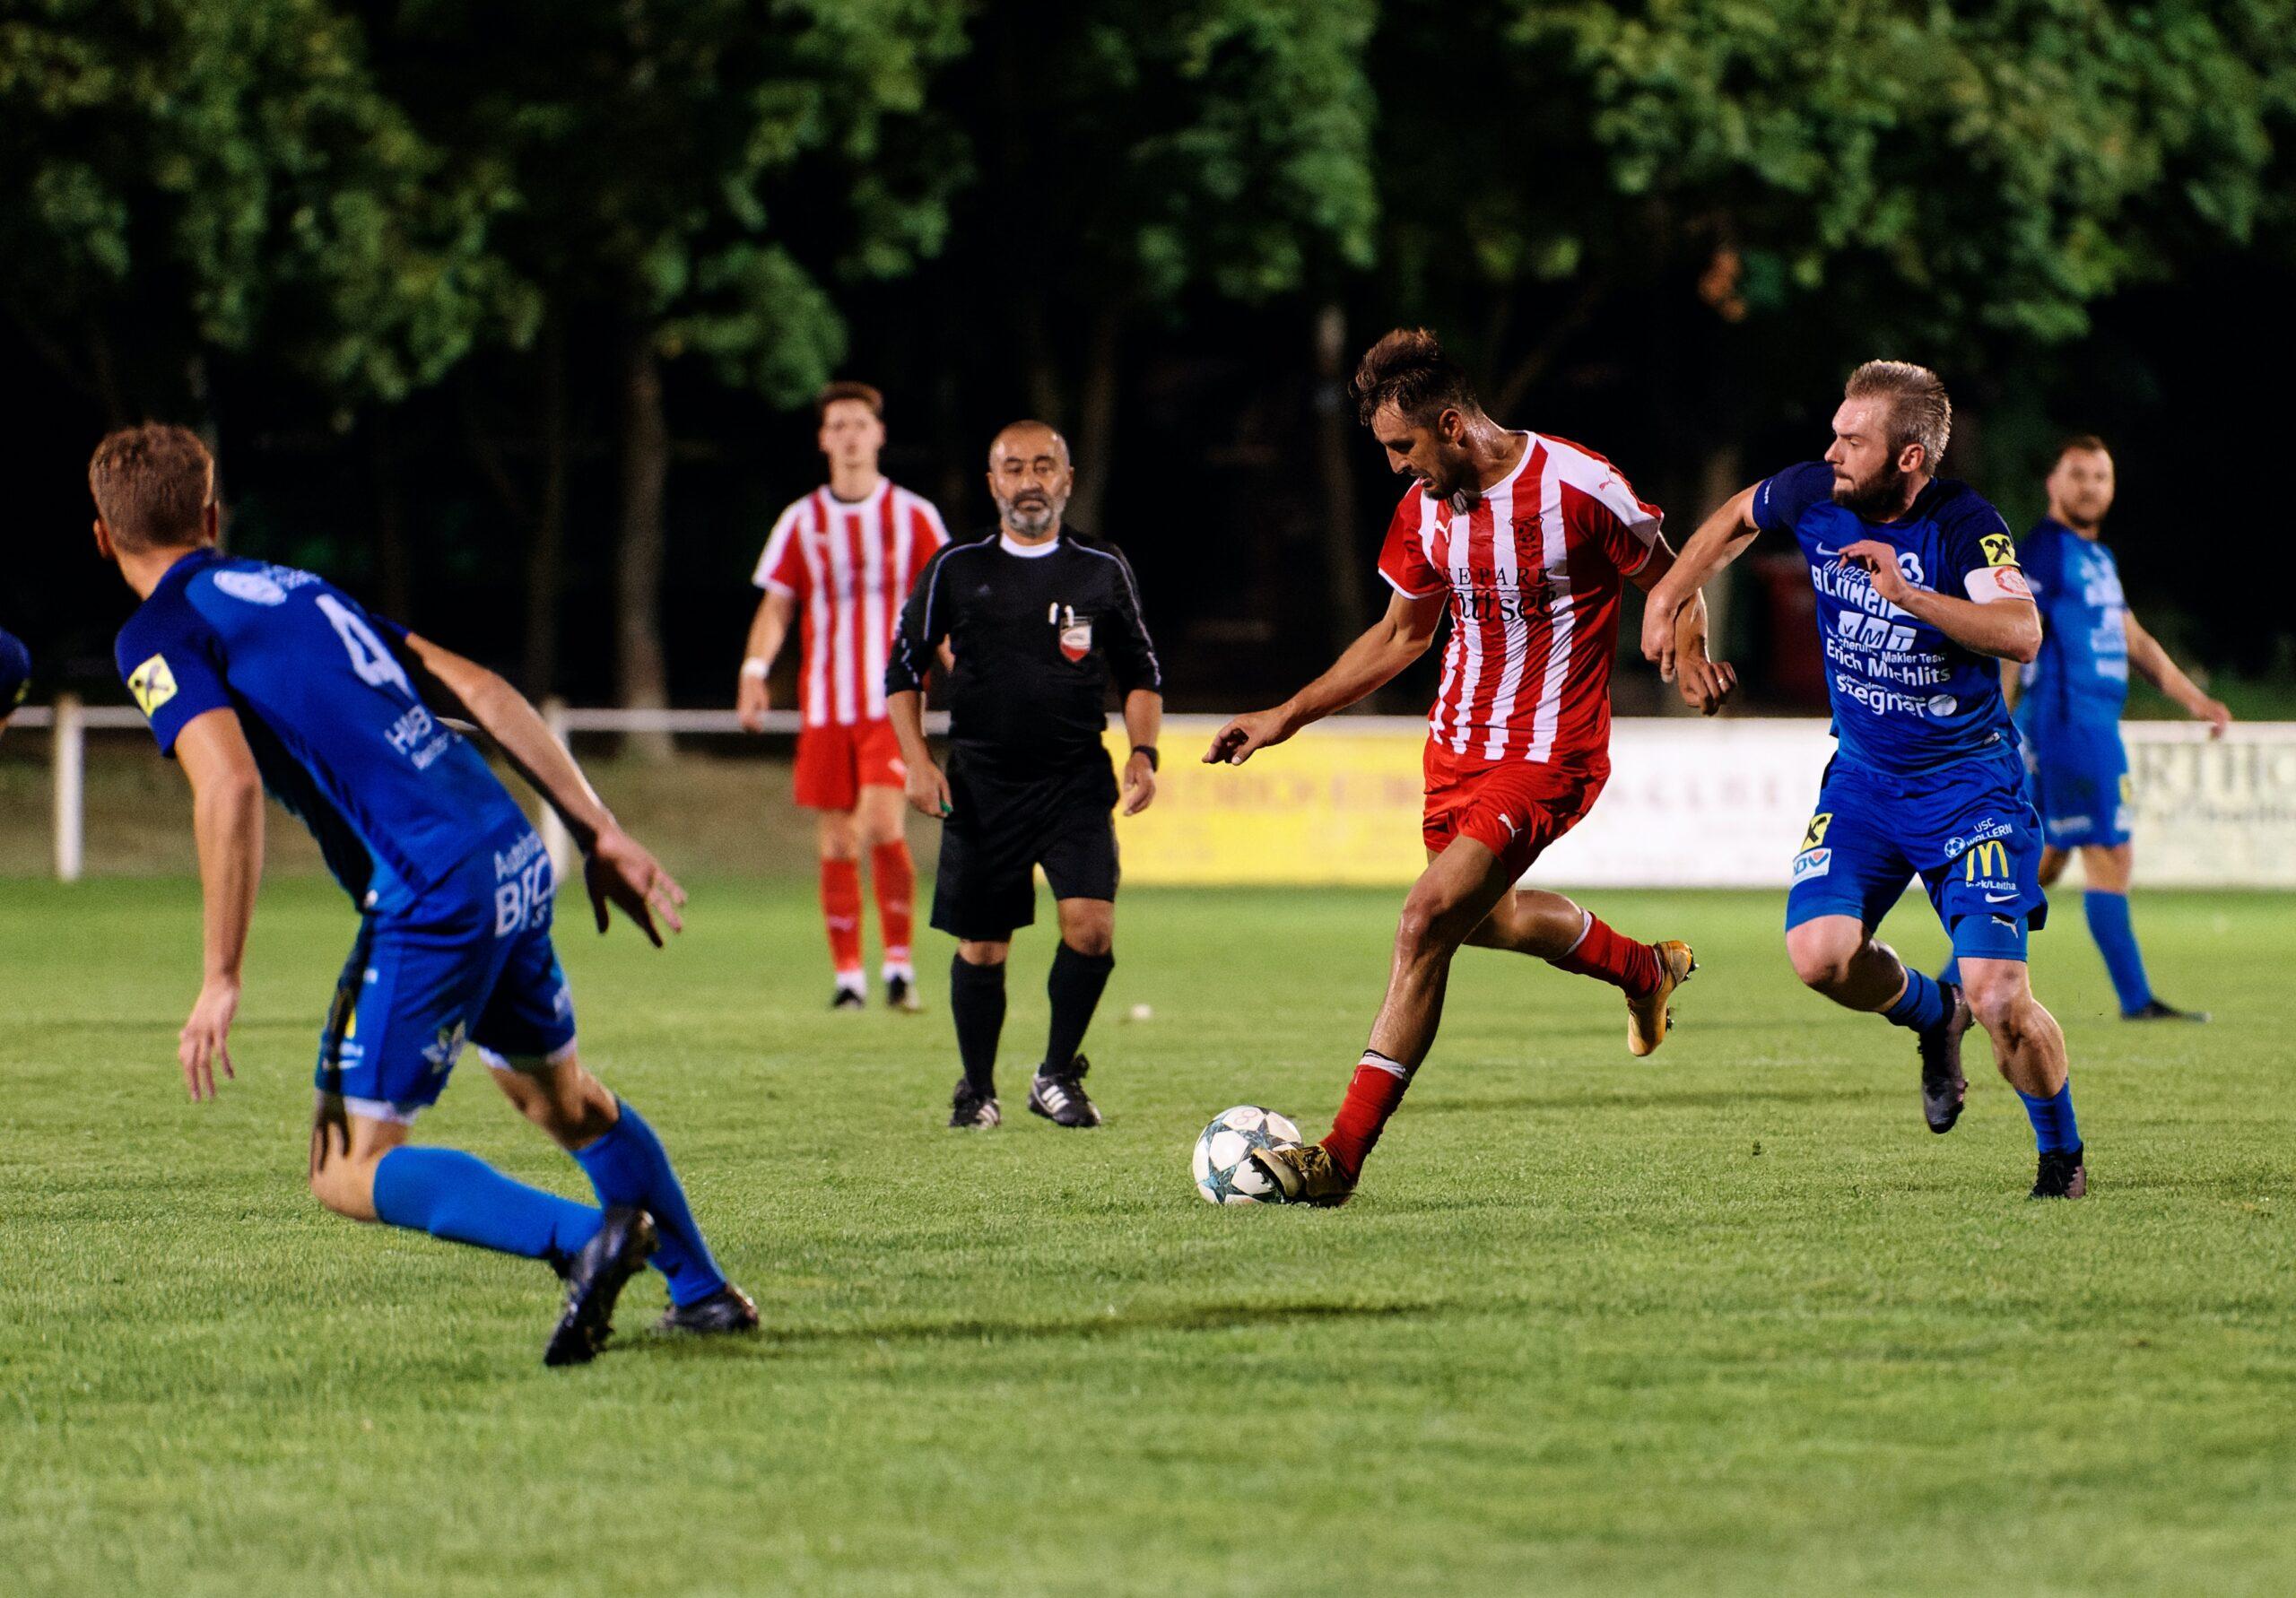 Jarolsav Machovec on the move